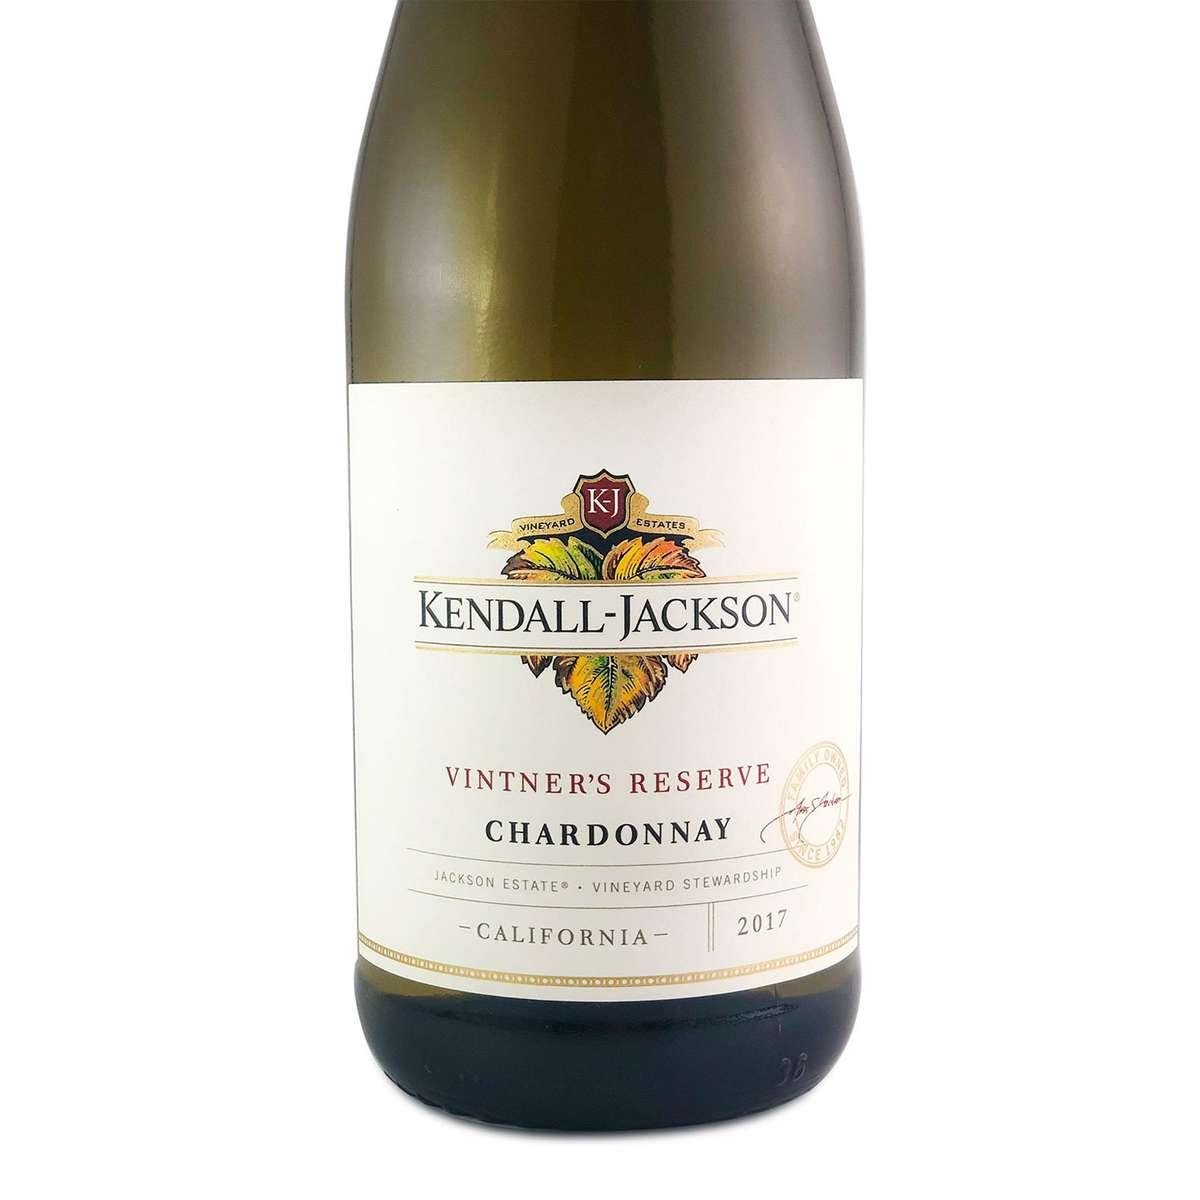 Kendall Jackson Vintner's Reserve Chardonnay – California